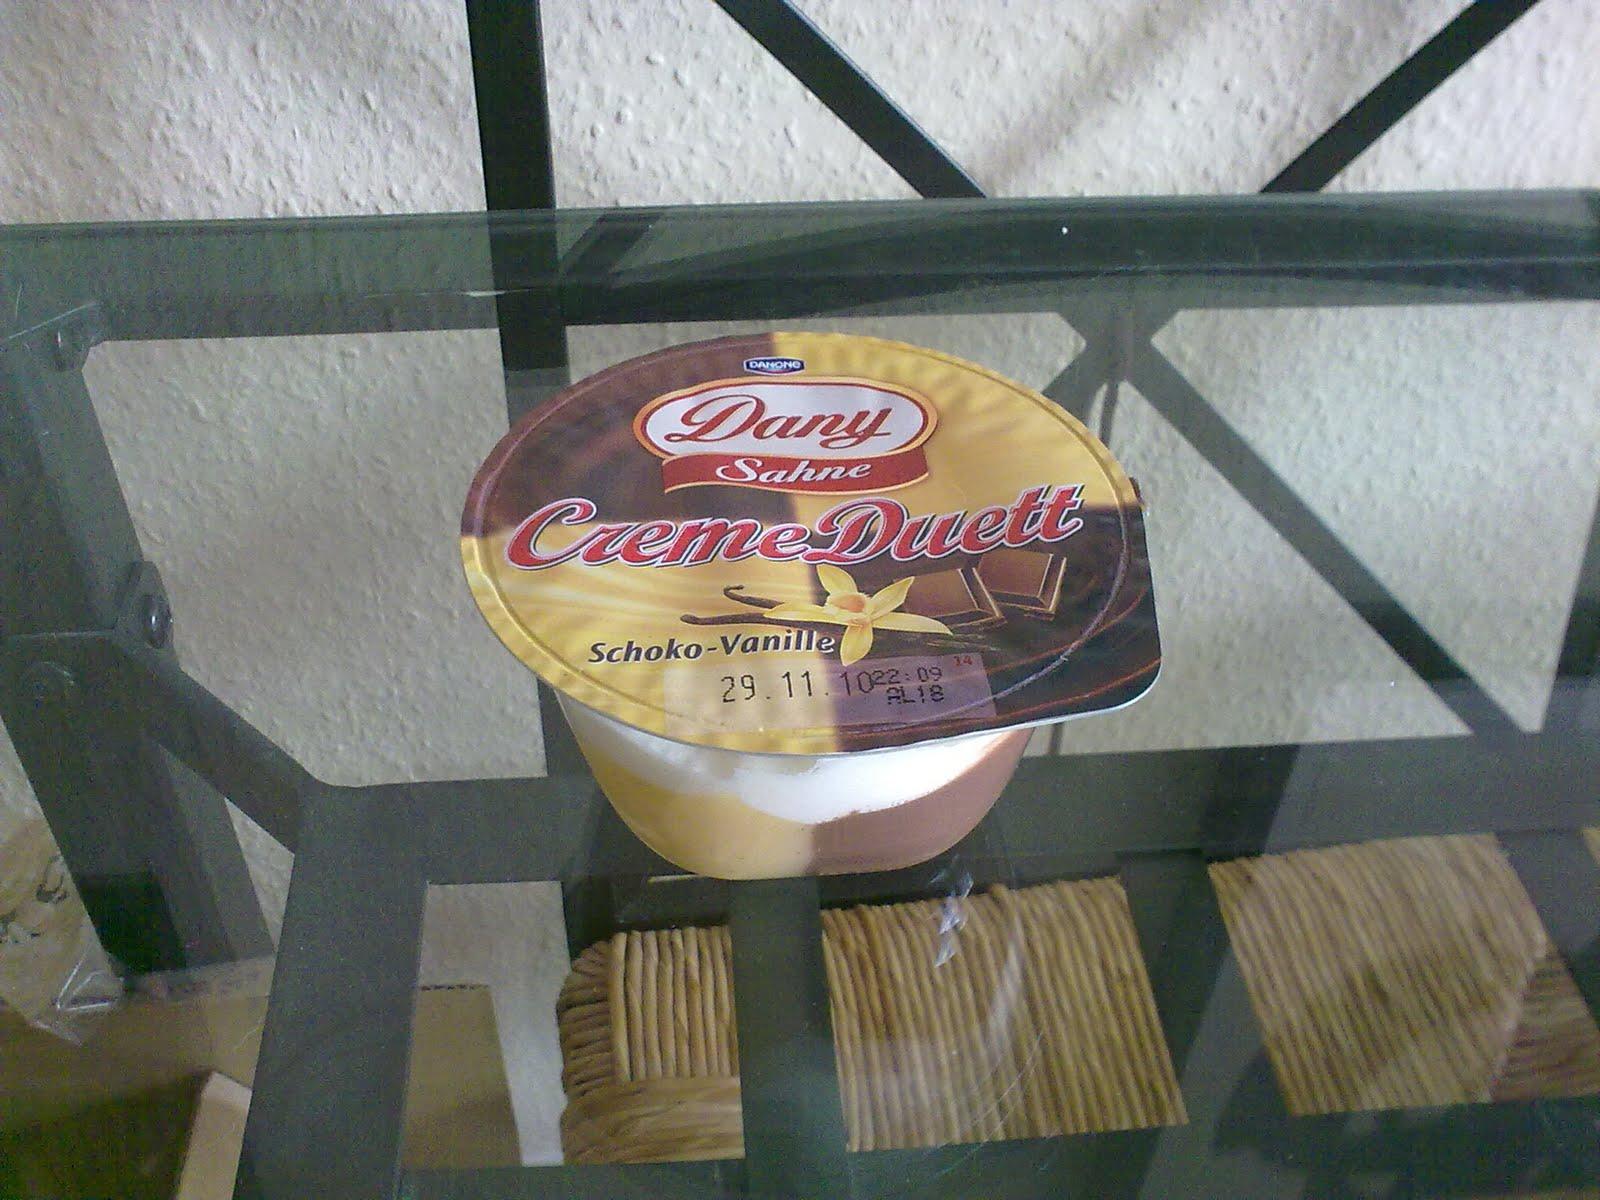 Dany Plus Sahne Kuchen Danysahne Schnitte 2019 02 15